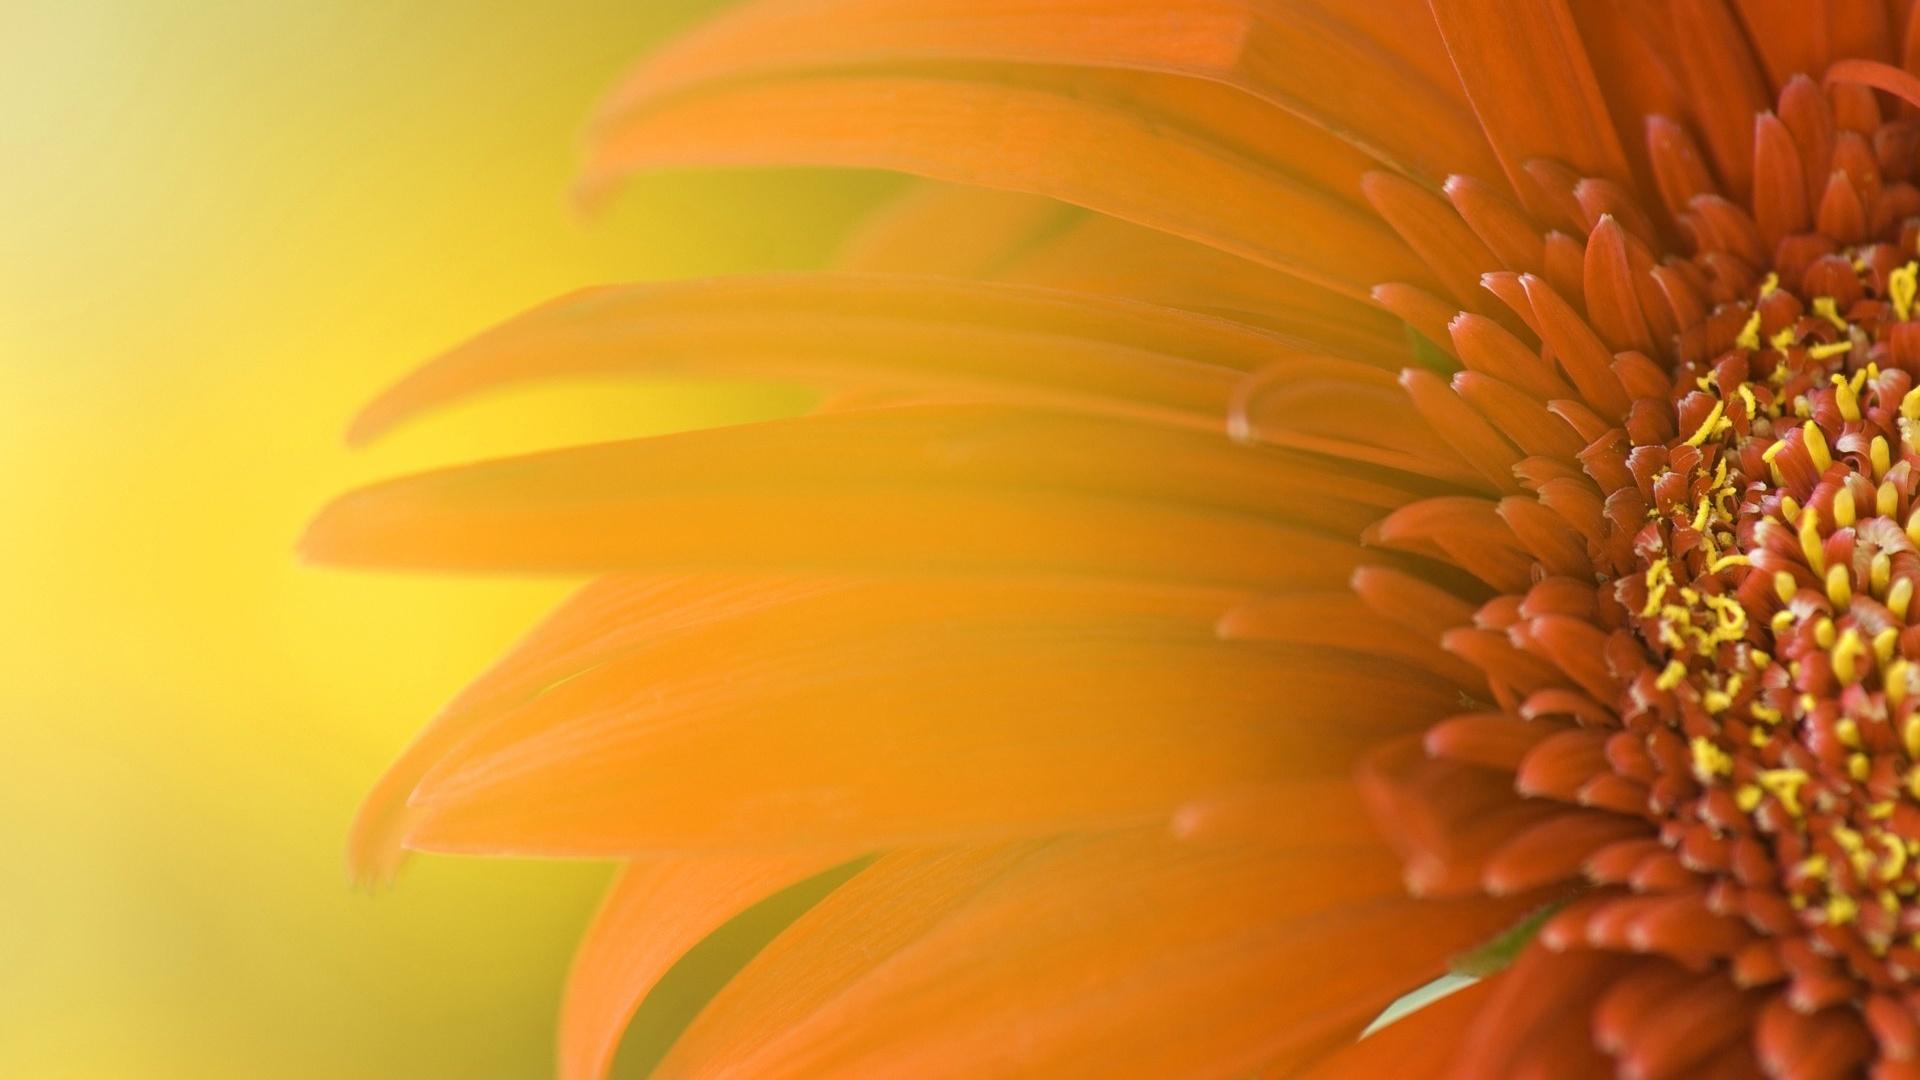 Orange Flower HD 863869 Orange Flower 863842 Orange Flower Wallpaper 1920x1080